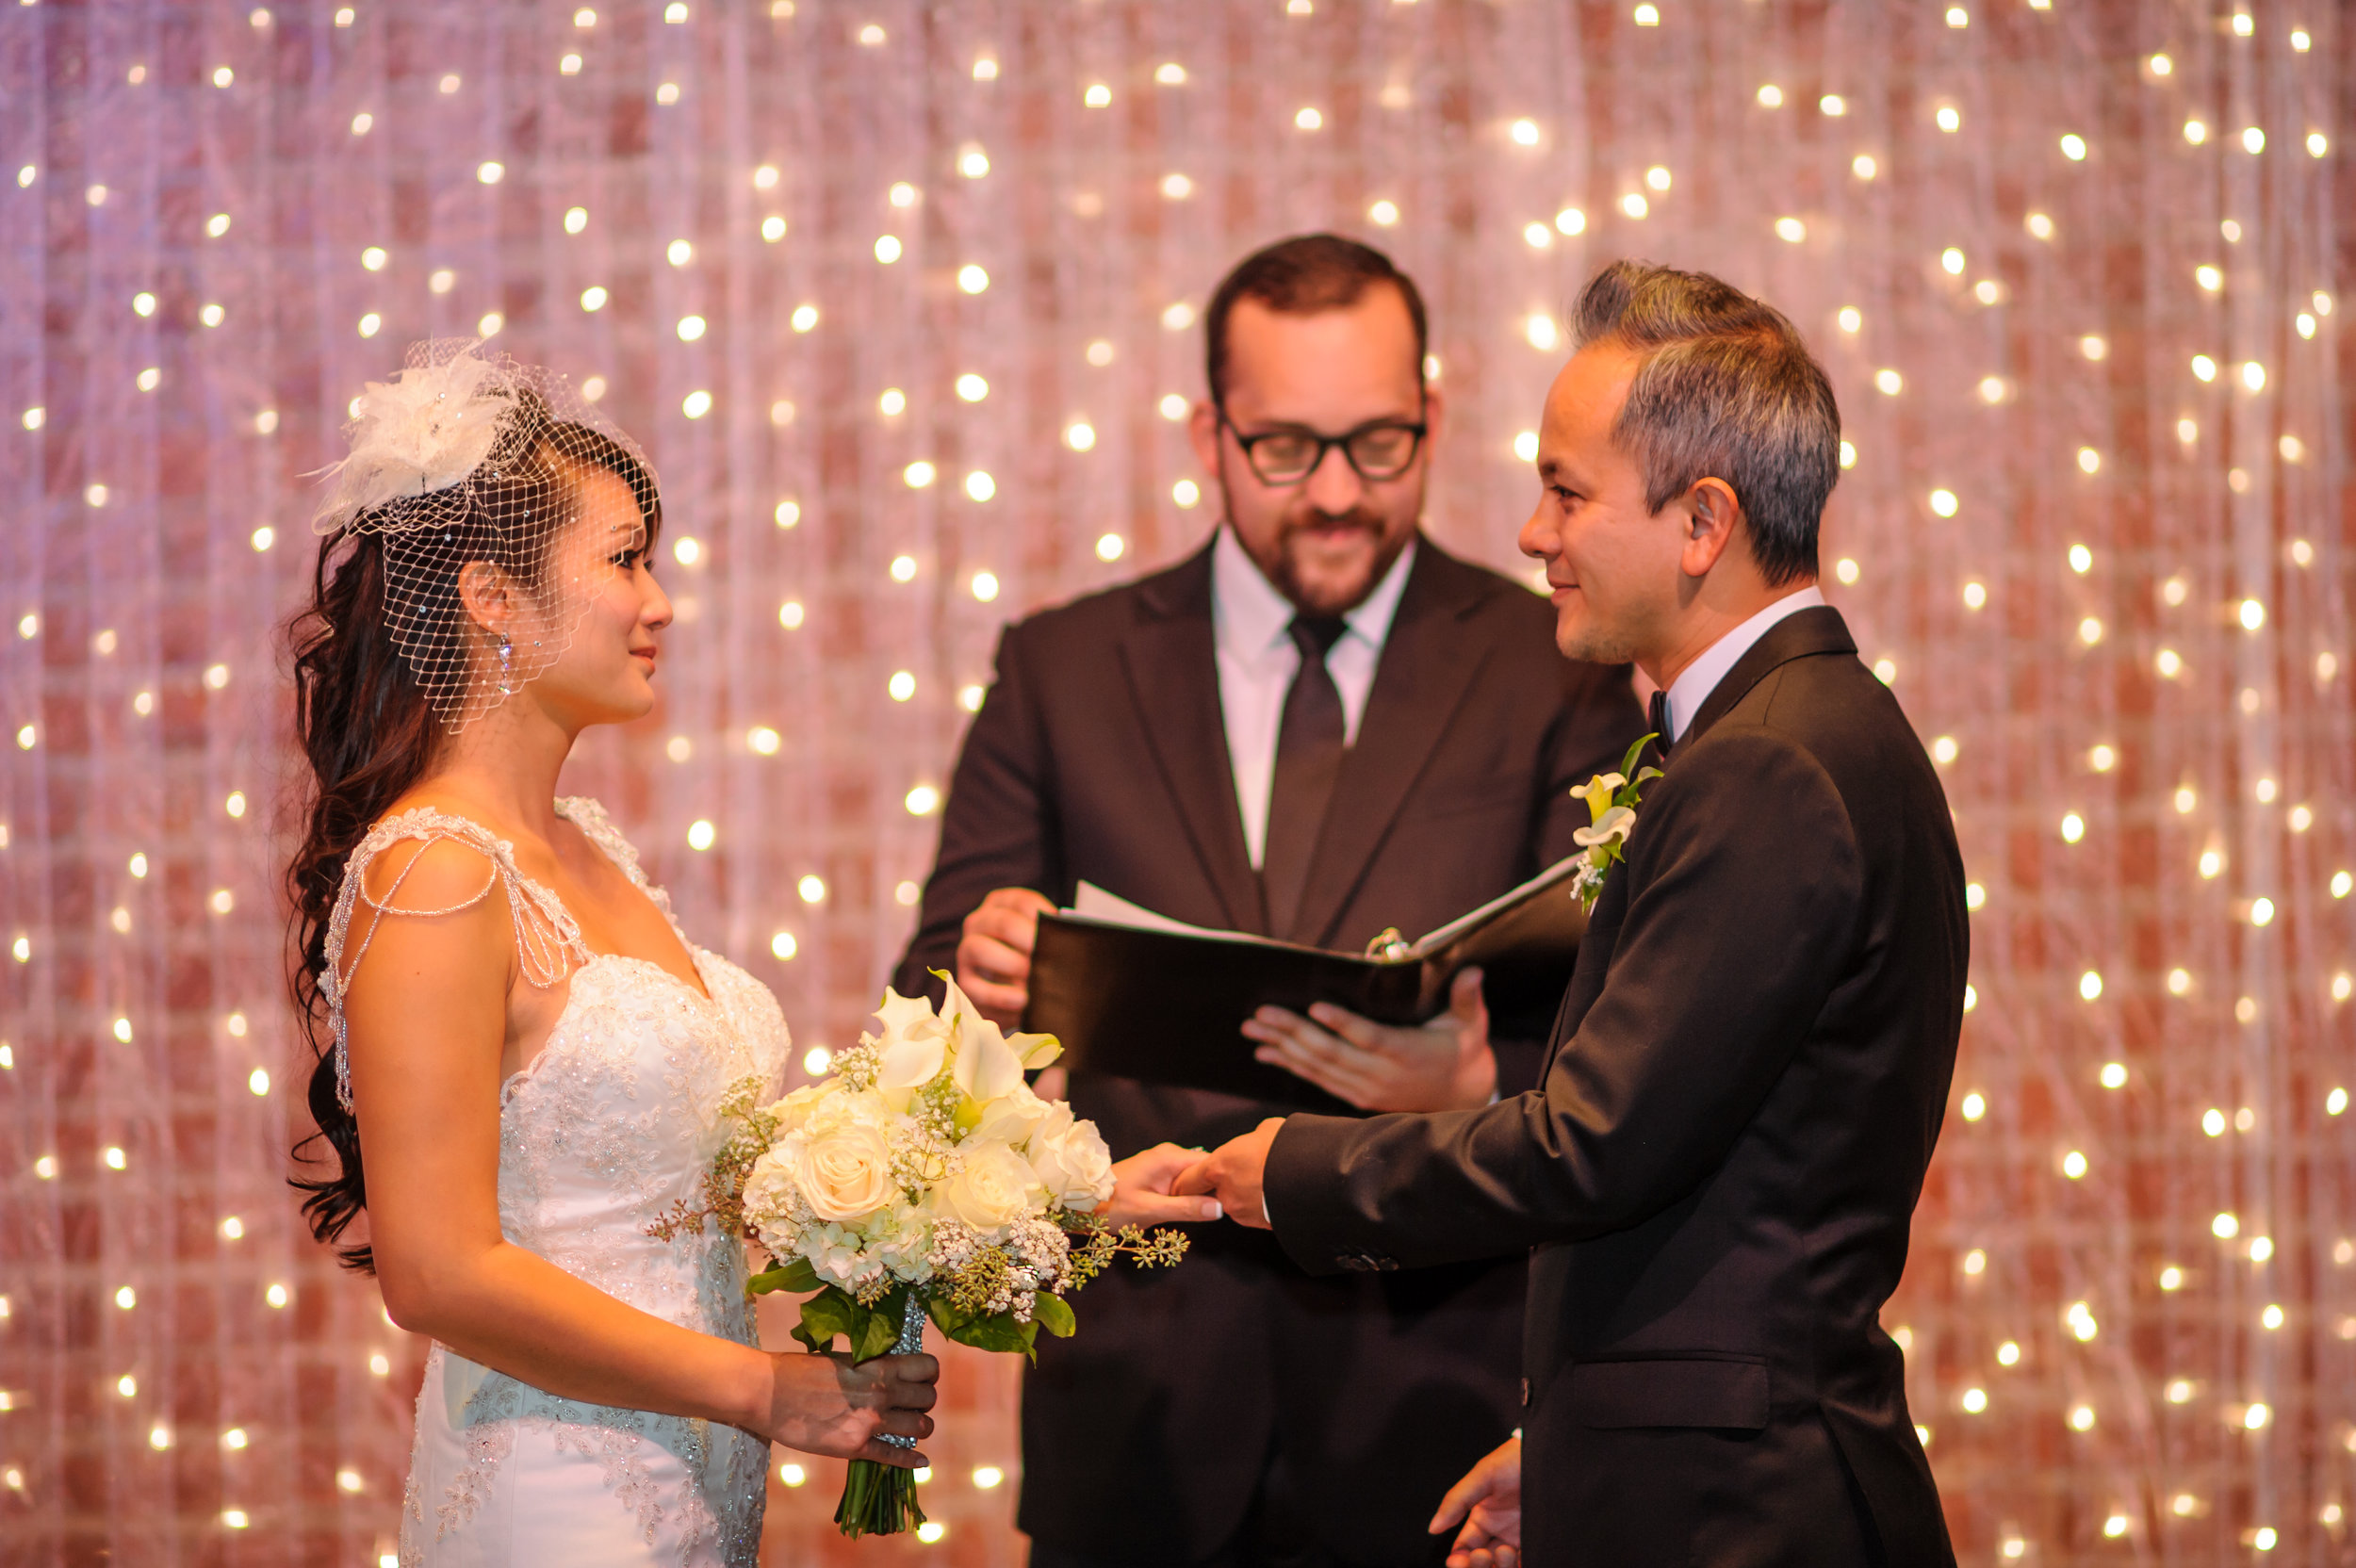 camilla-thuy-098-memorial-auditorium-sacramento-wedding-photographer-katherine-nicole-photography.JPG